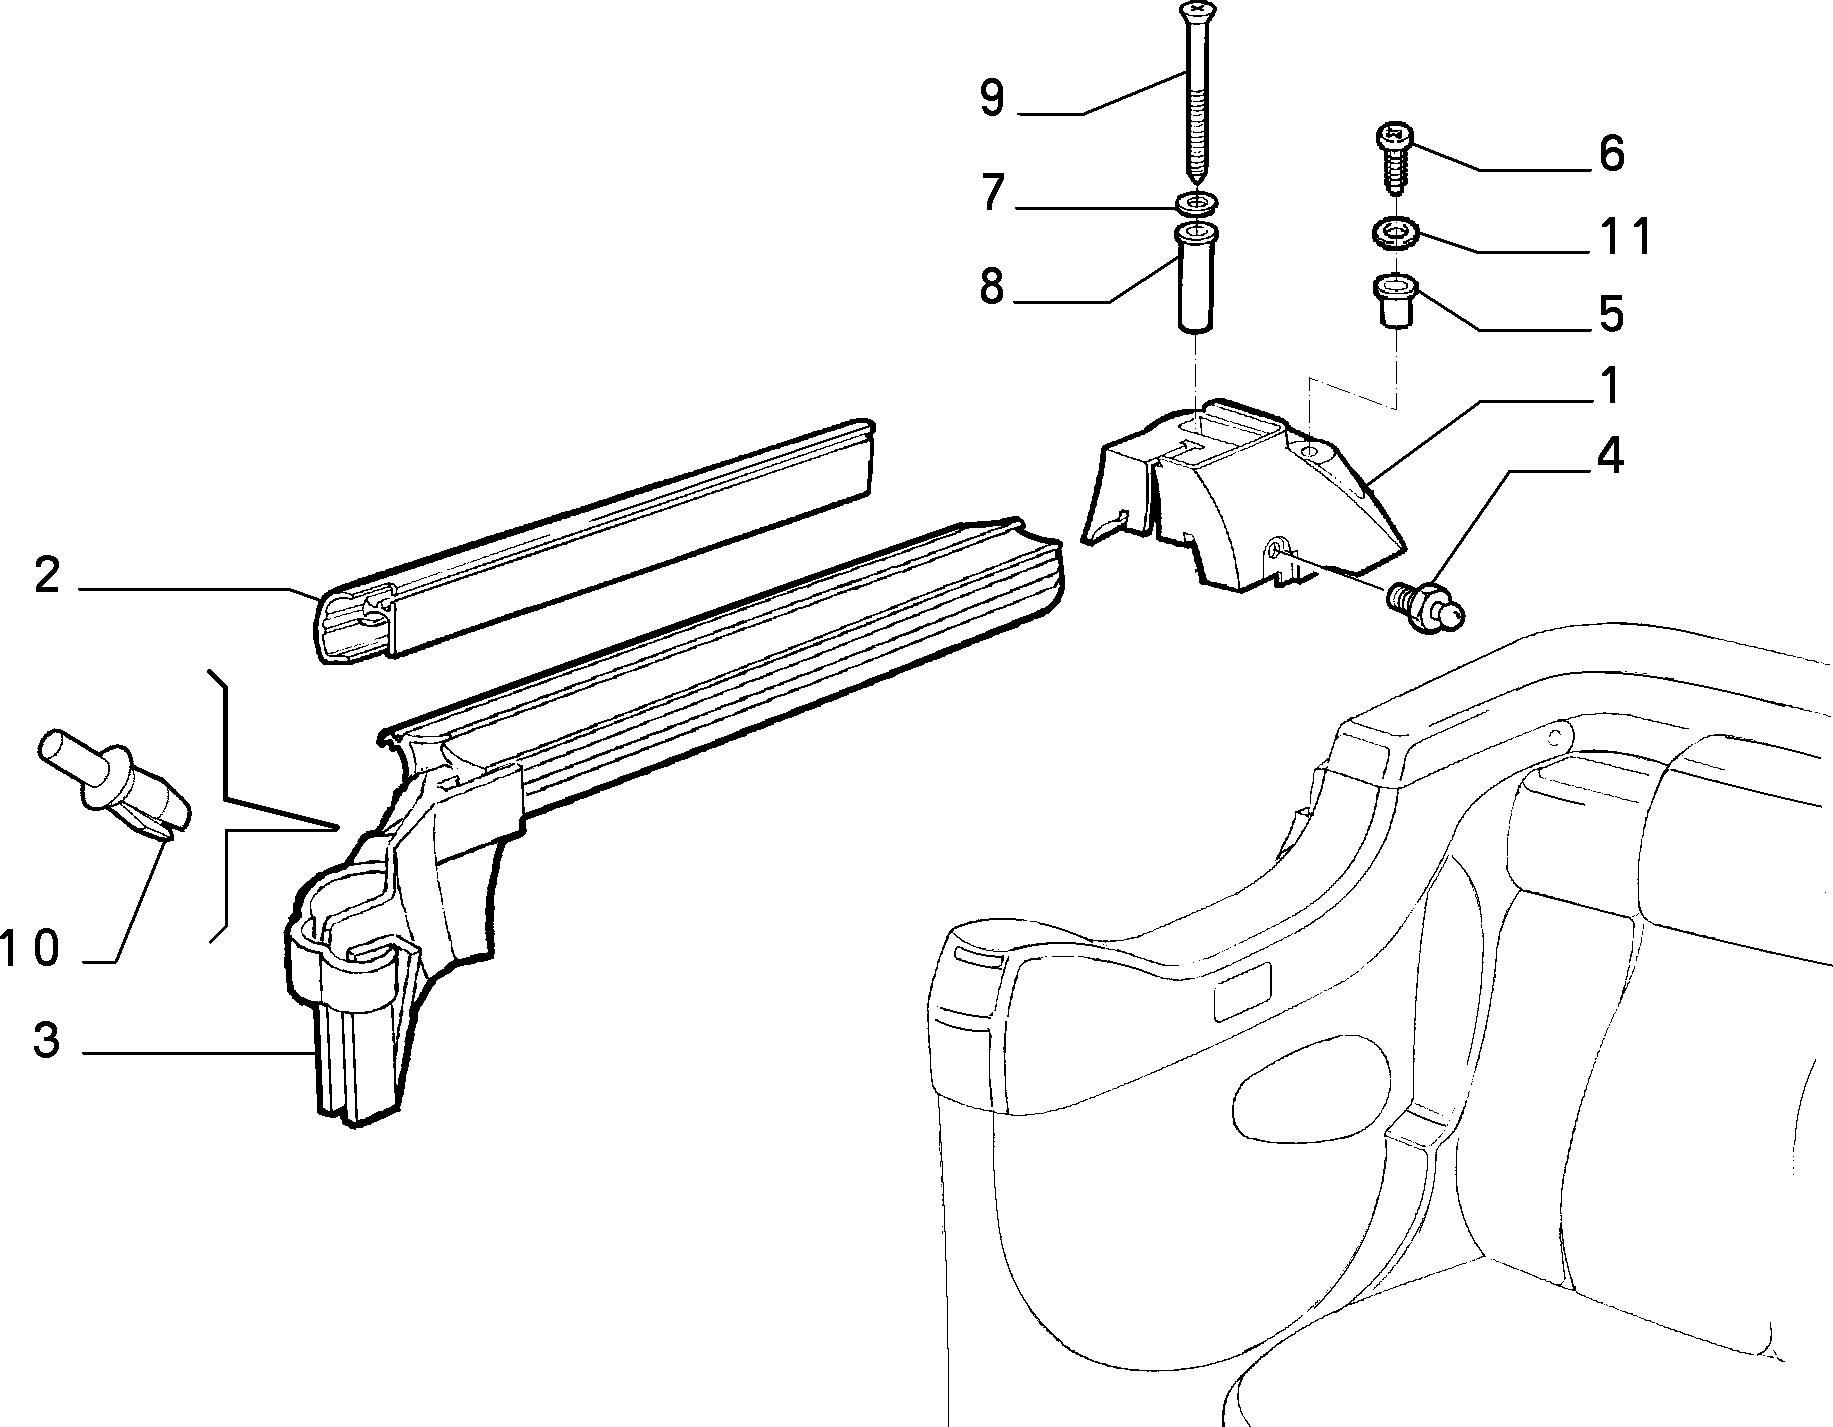 70156/00 БОКОВОЕ ОКНО